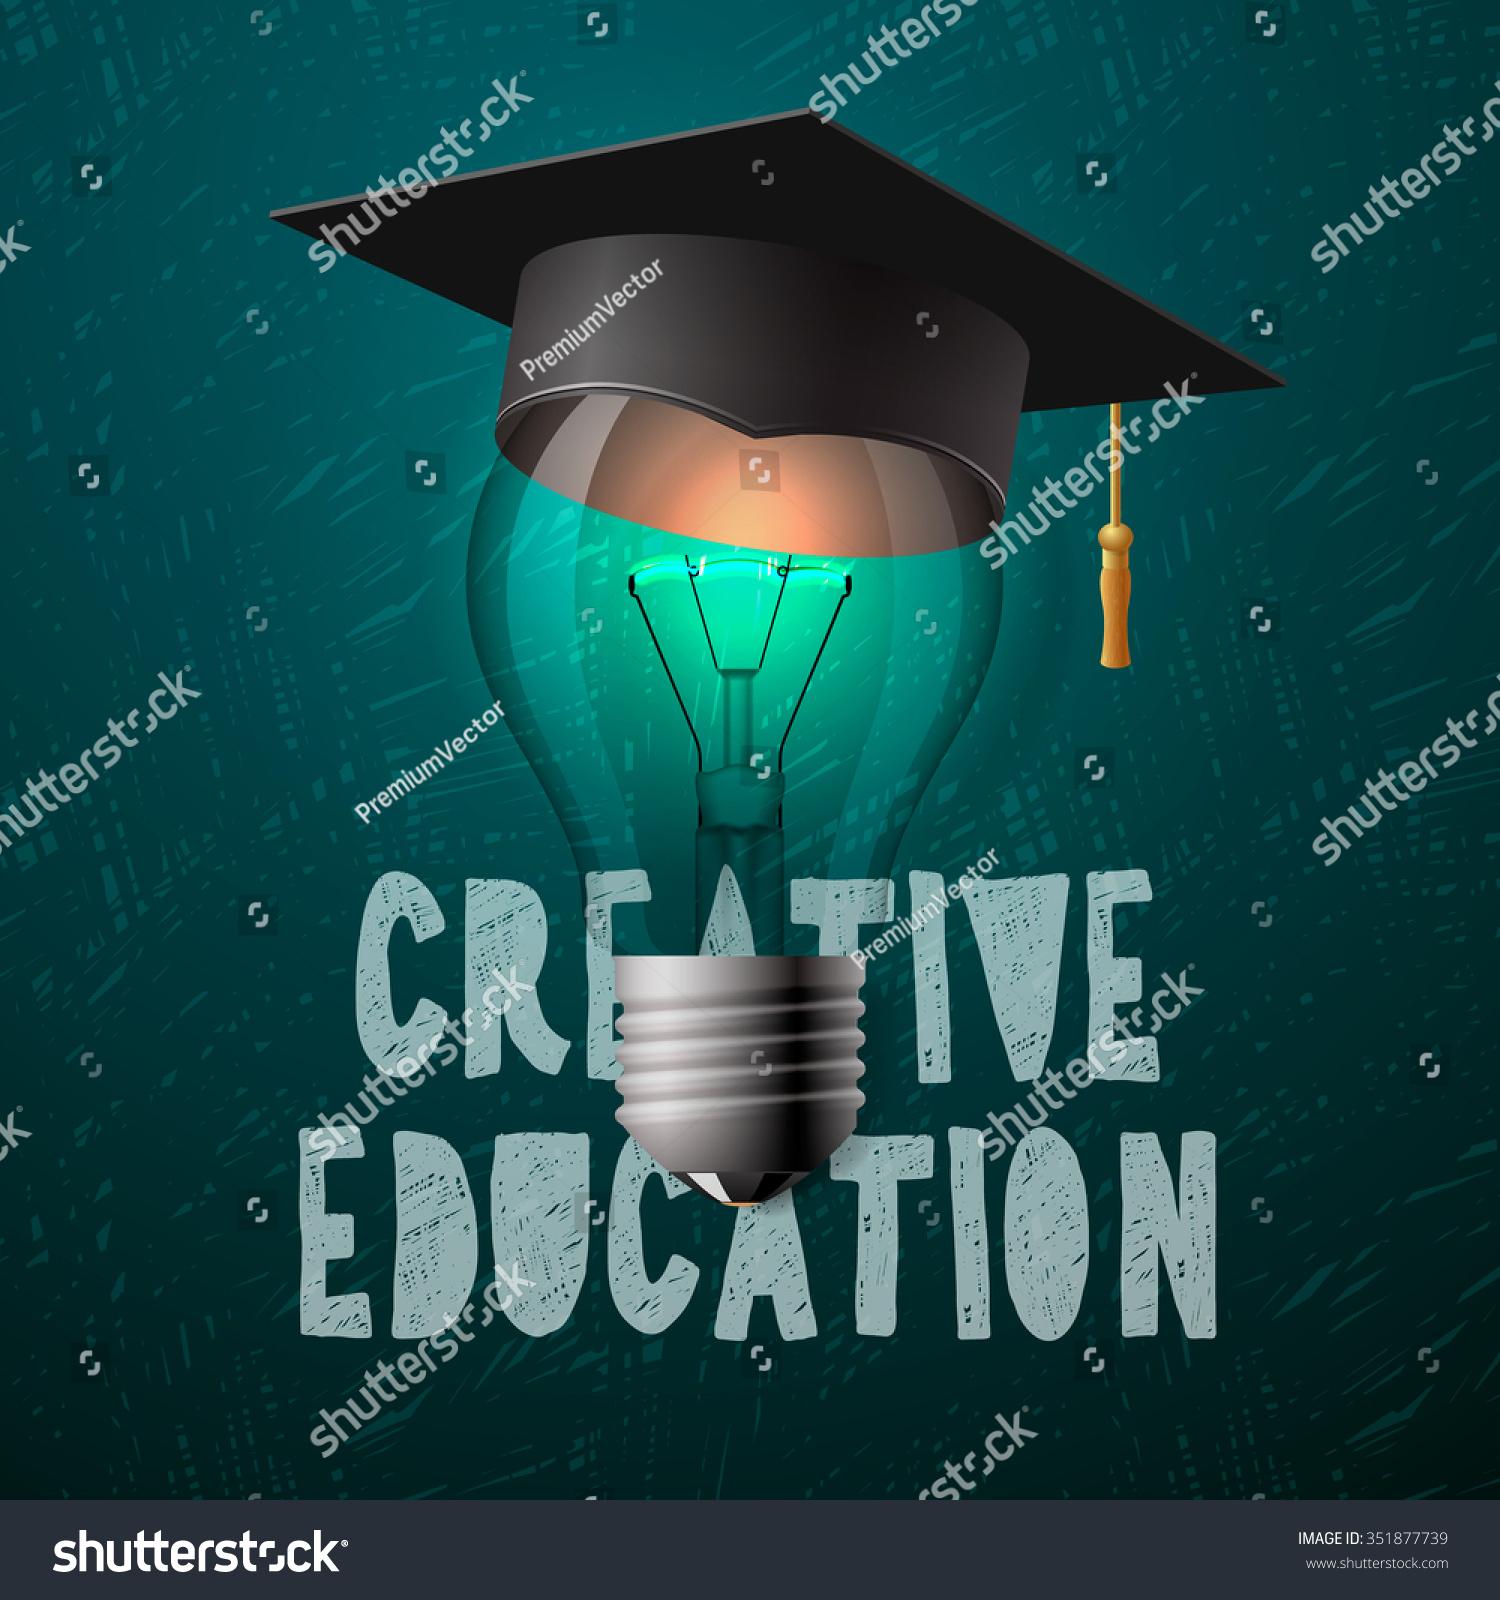 Creative Education Design Light Bulb Mortarboard Stock Vector